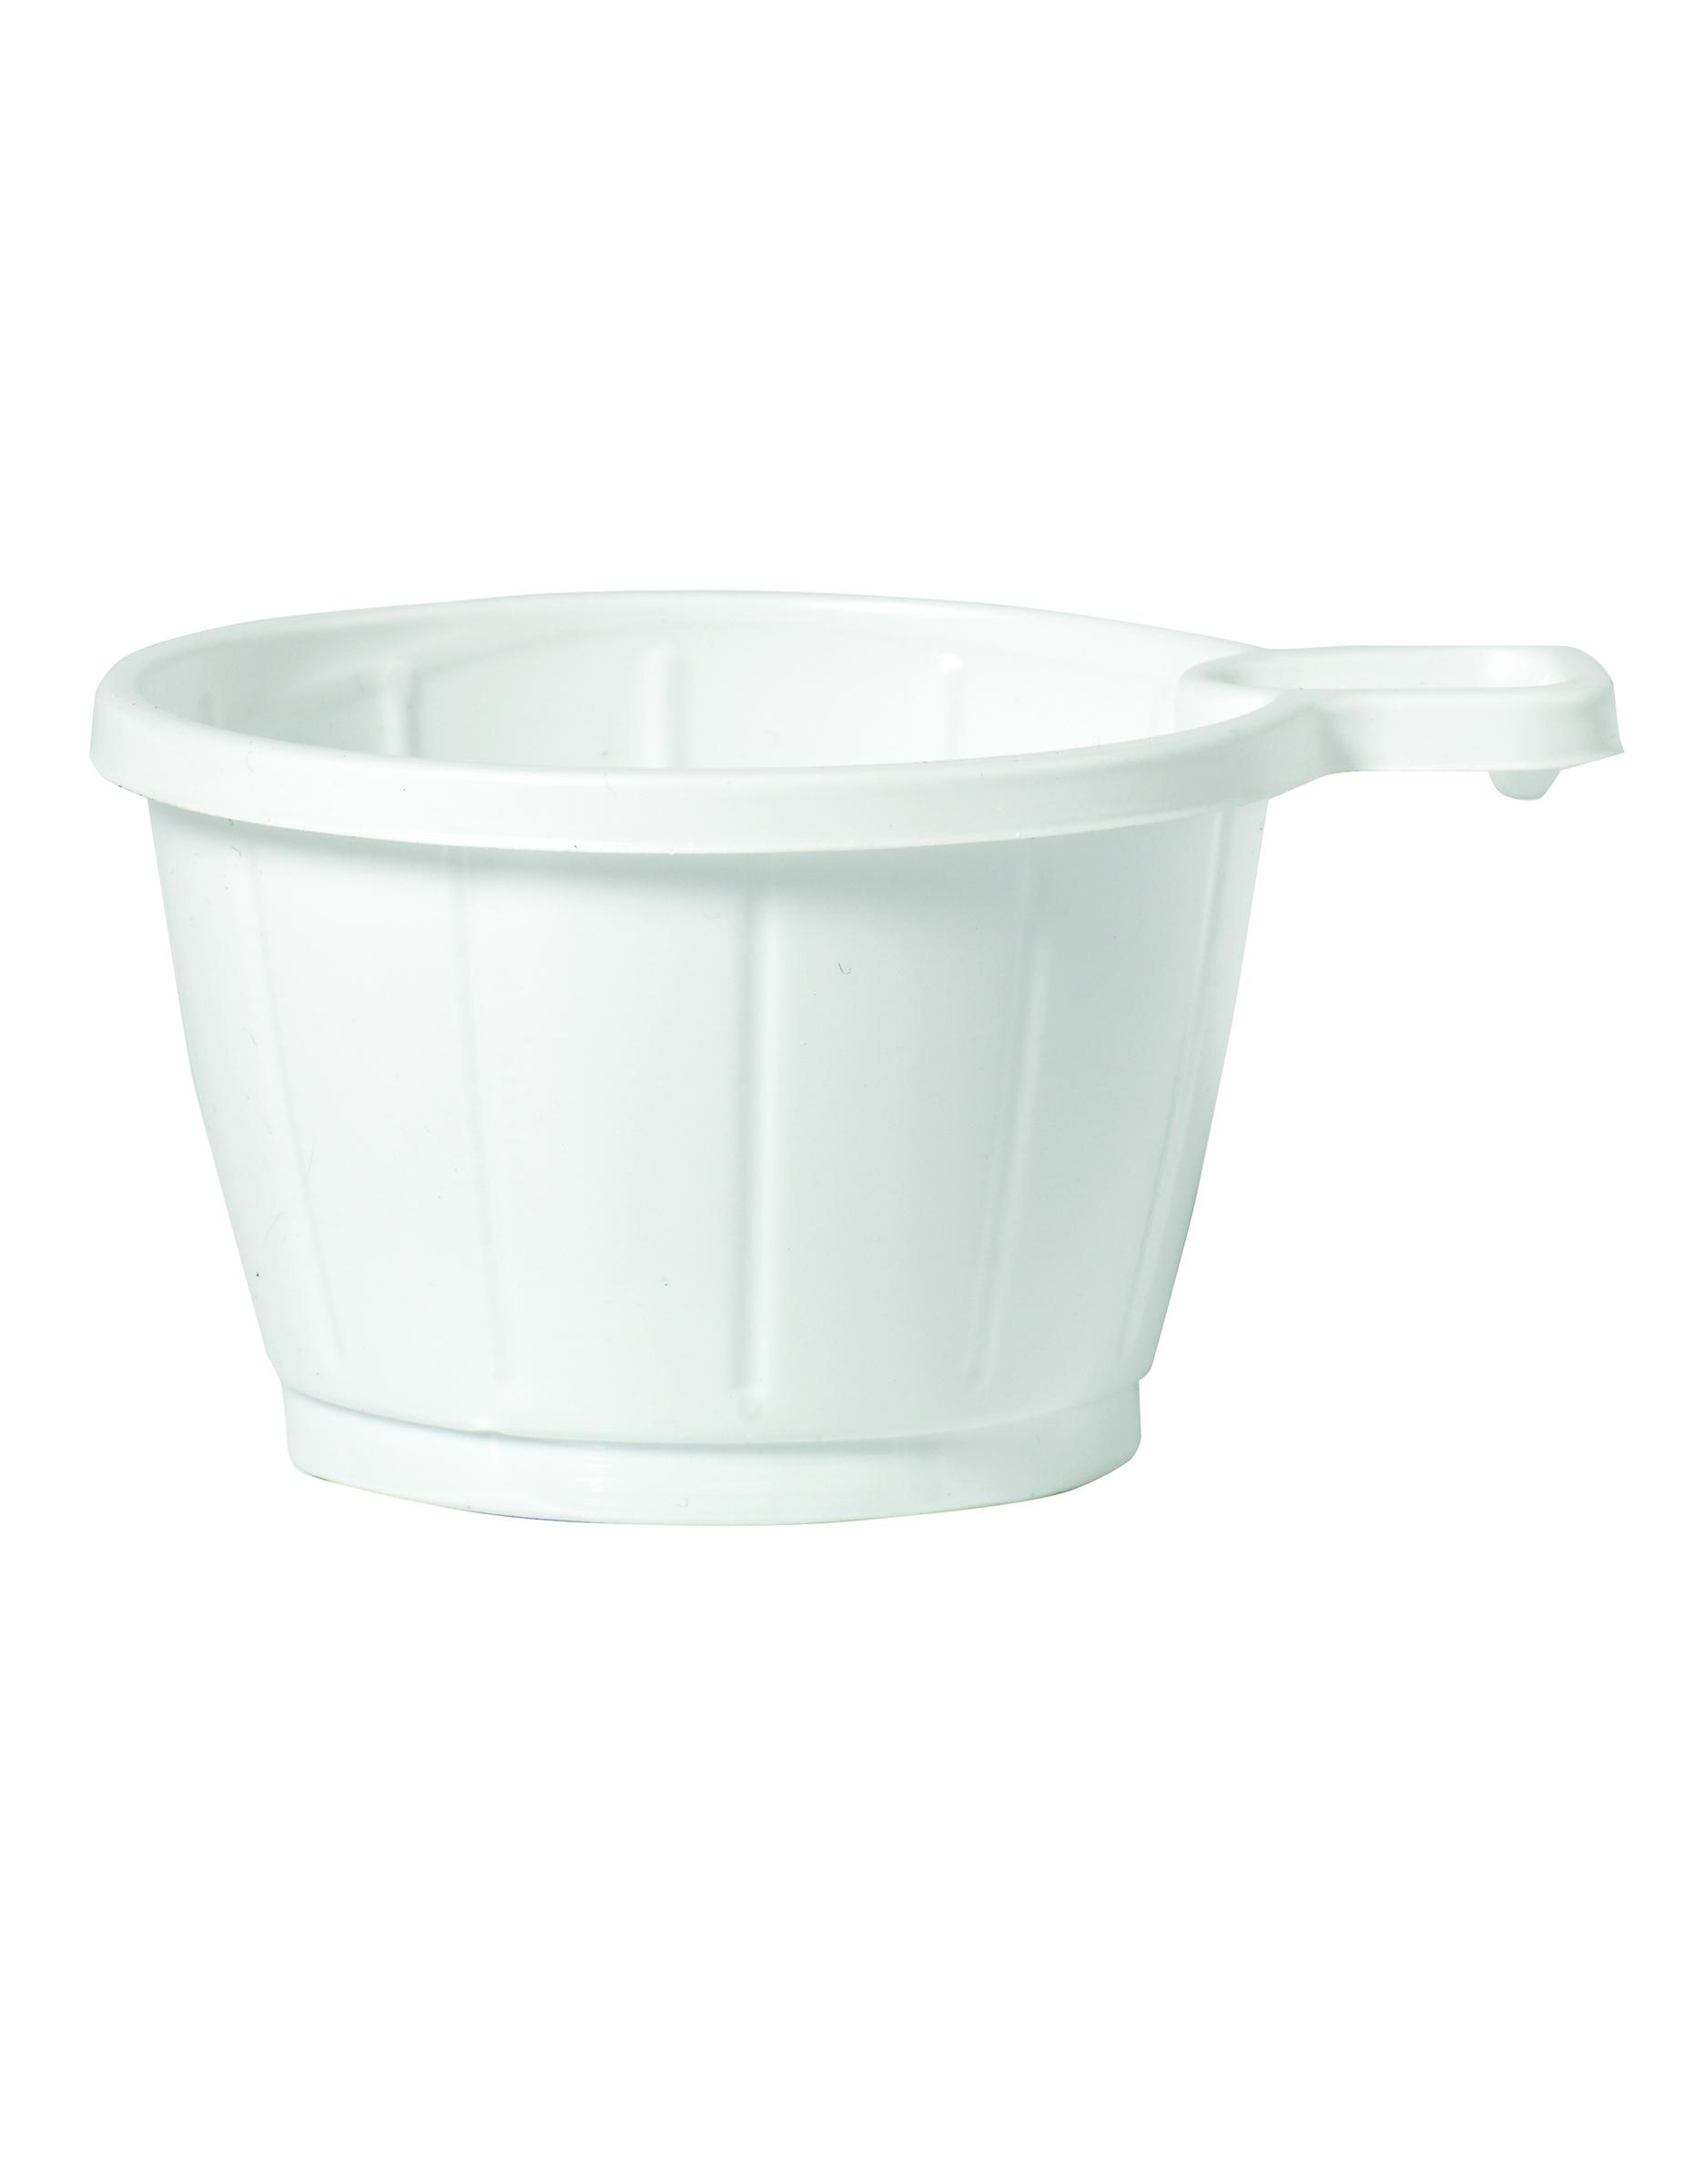 50 tasses caf en plastique blanc 20 cl deguise toi achat de decoration animation. Black Bedroom Furniture Sets. Home Design Ideas